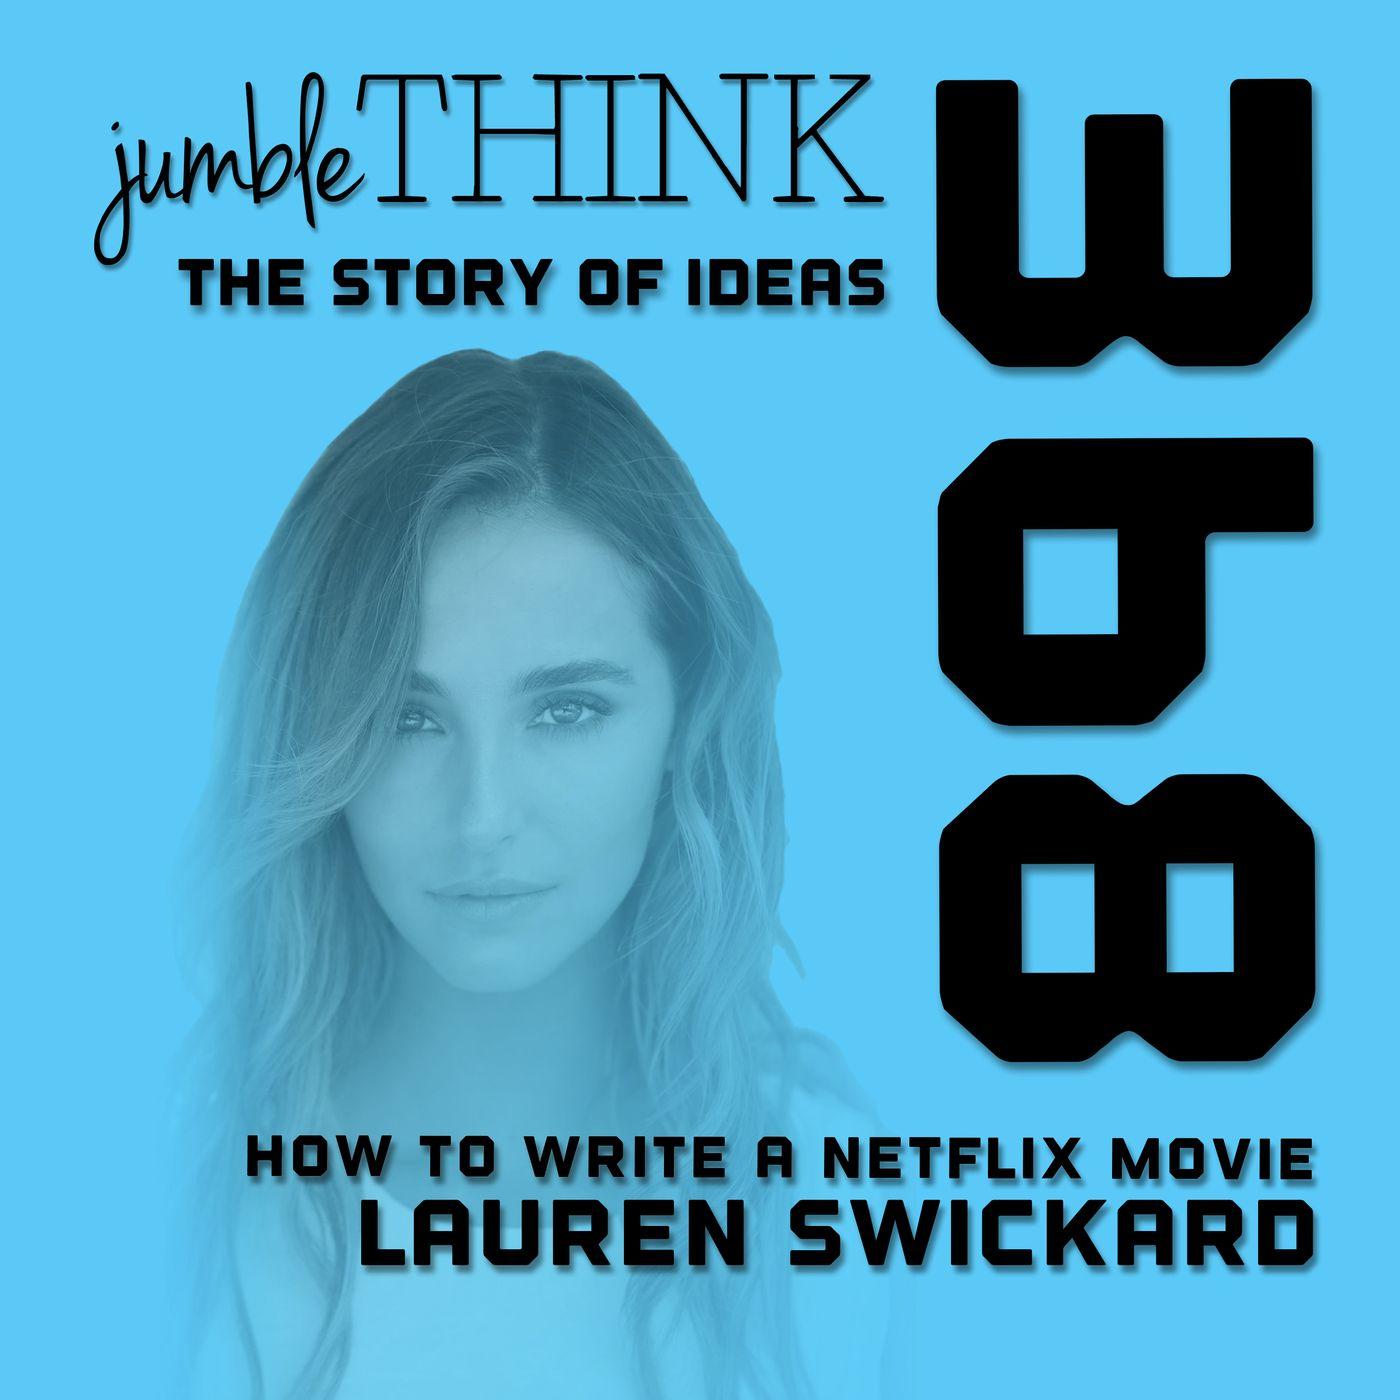 How to Write a Netflix Movie with Lauren Swickard